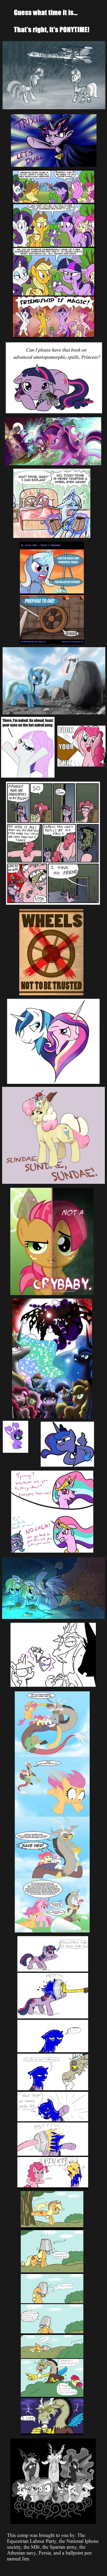 Ponycomp 220. Ponycomp 219: funnyjunk.com/channel/ponytime/Ponycomp+219/rbmjGeo/ DOWNLOAD LINK docs.google.com/folder/d/0B4SOCzXHPRDVRC1RYTBSTWZLLVU/edit.